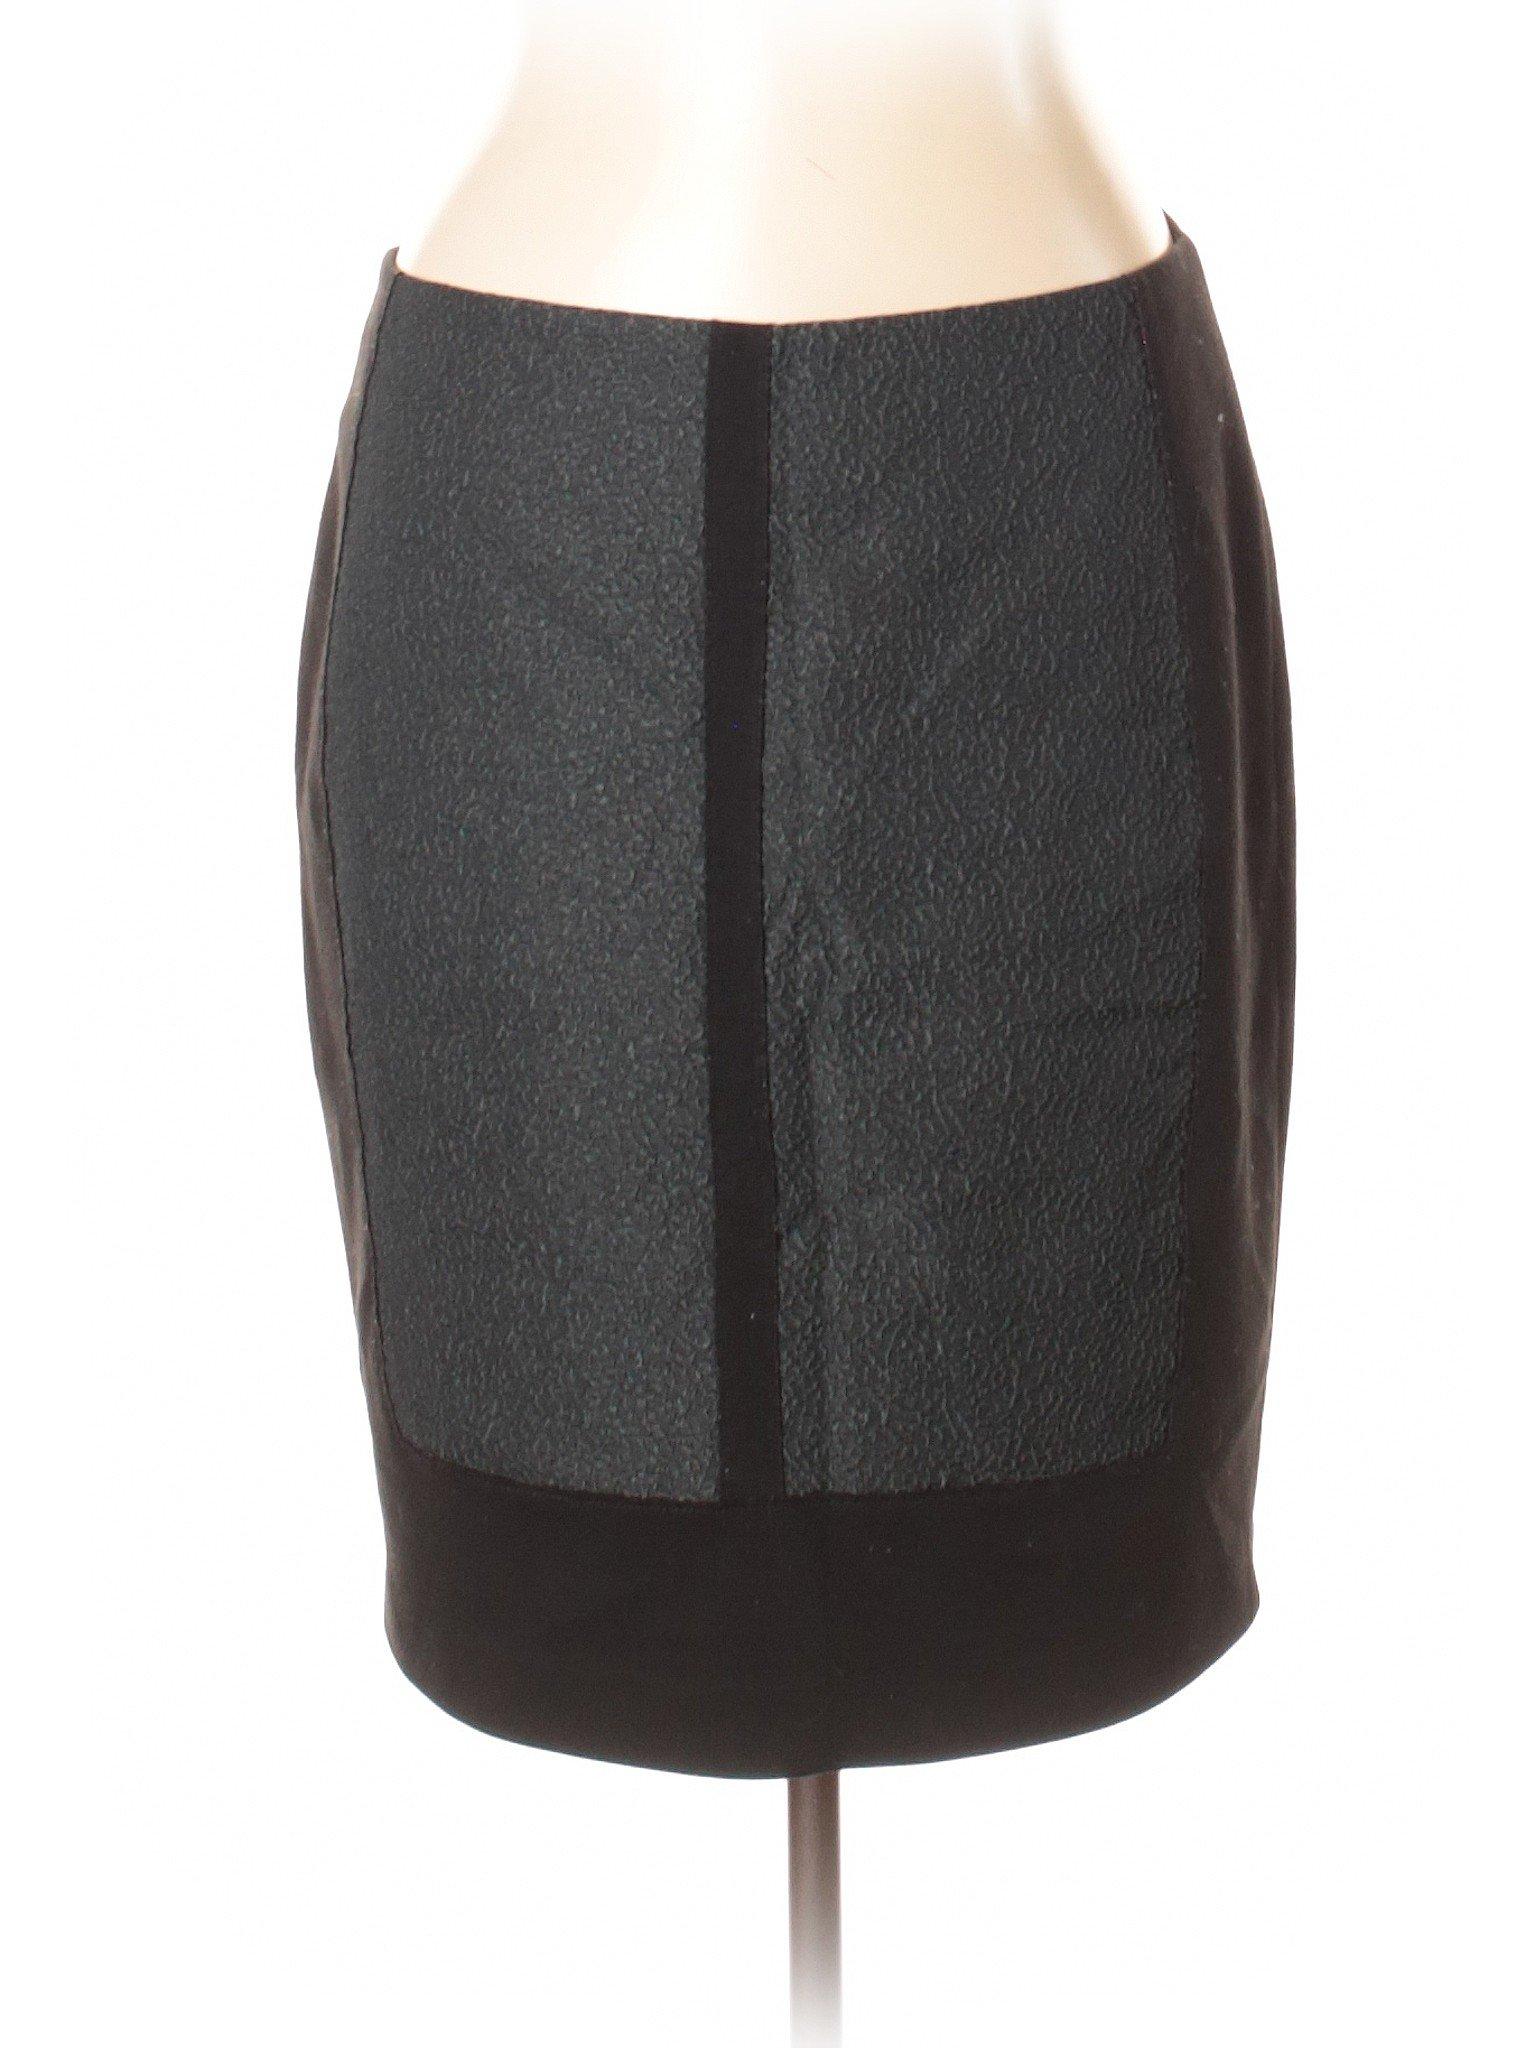 Boutique Skirt Skirt Boutique Boutique Casual Boutique Boutique Skirt Casual Skirt Casual Casual Uxwn1Aq